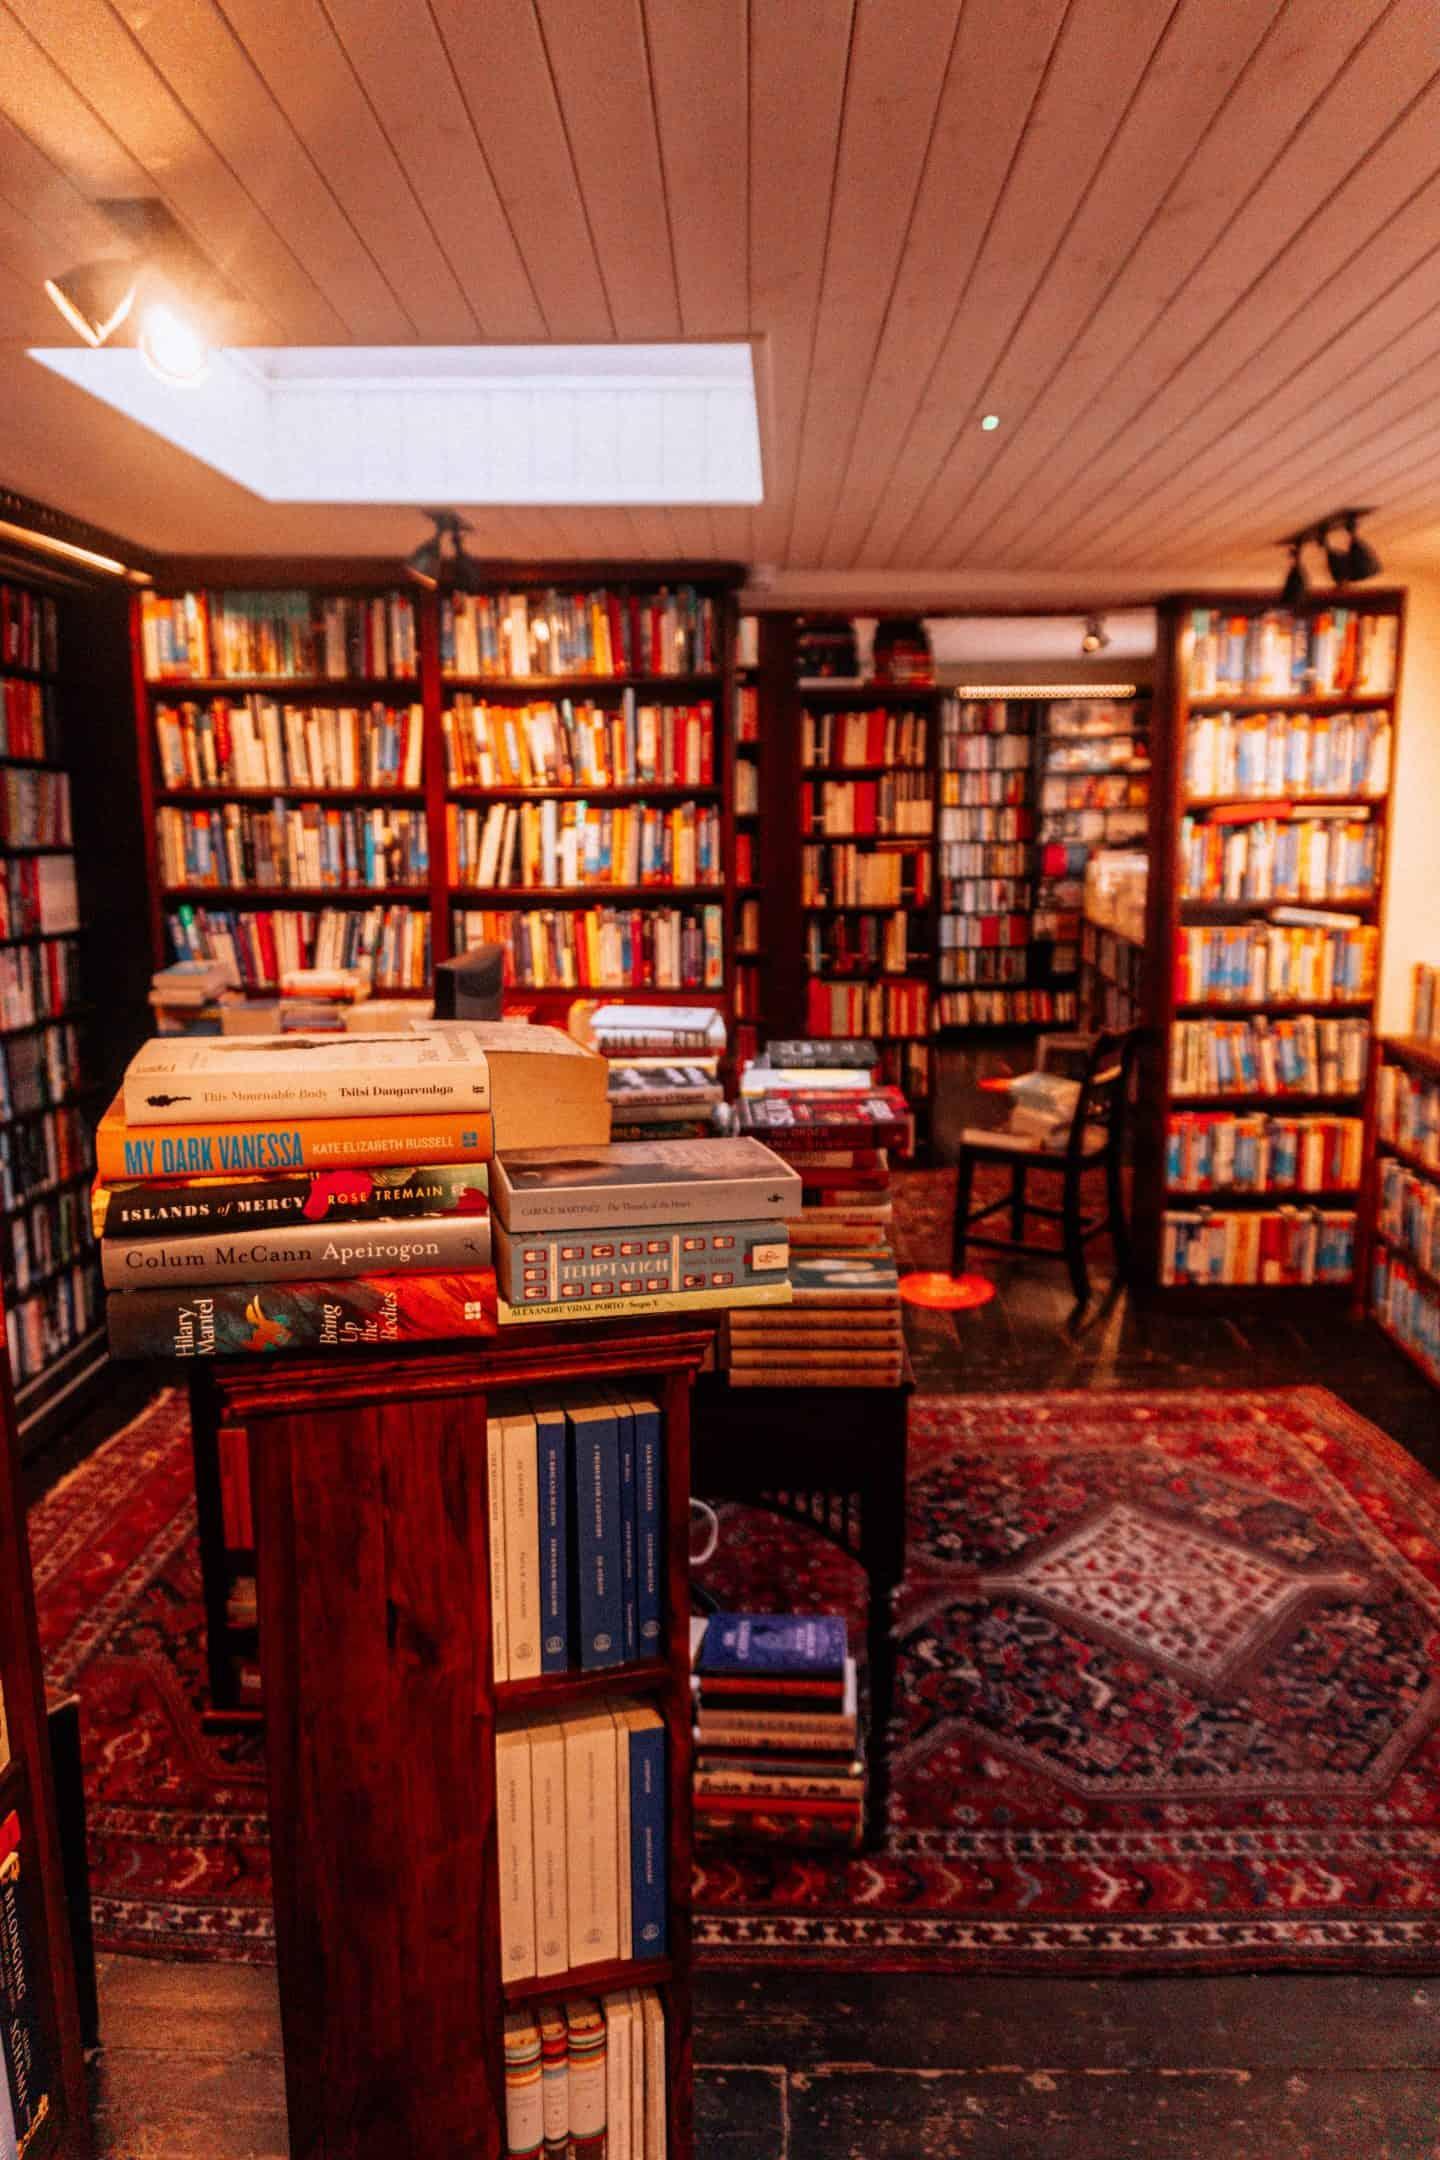 John Sandoe's Bookstore Inside